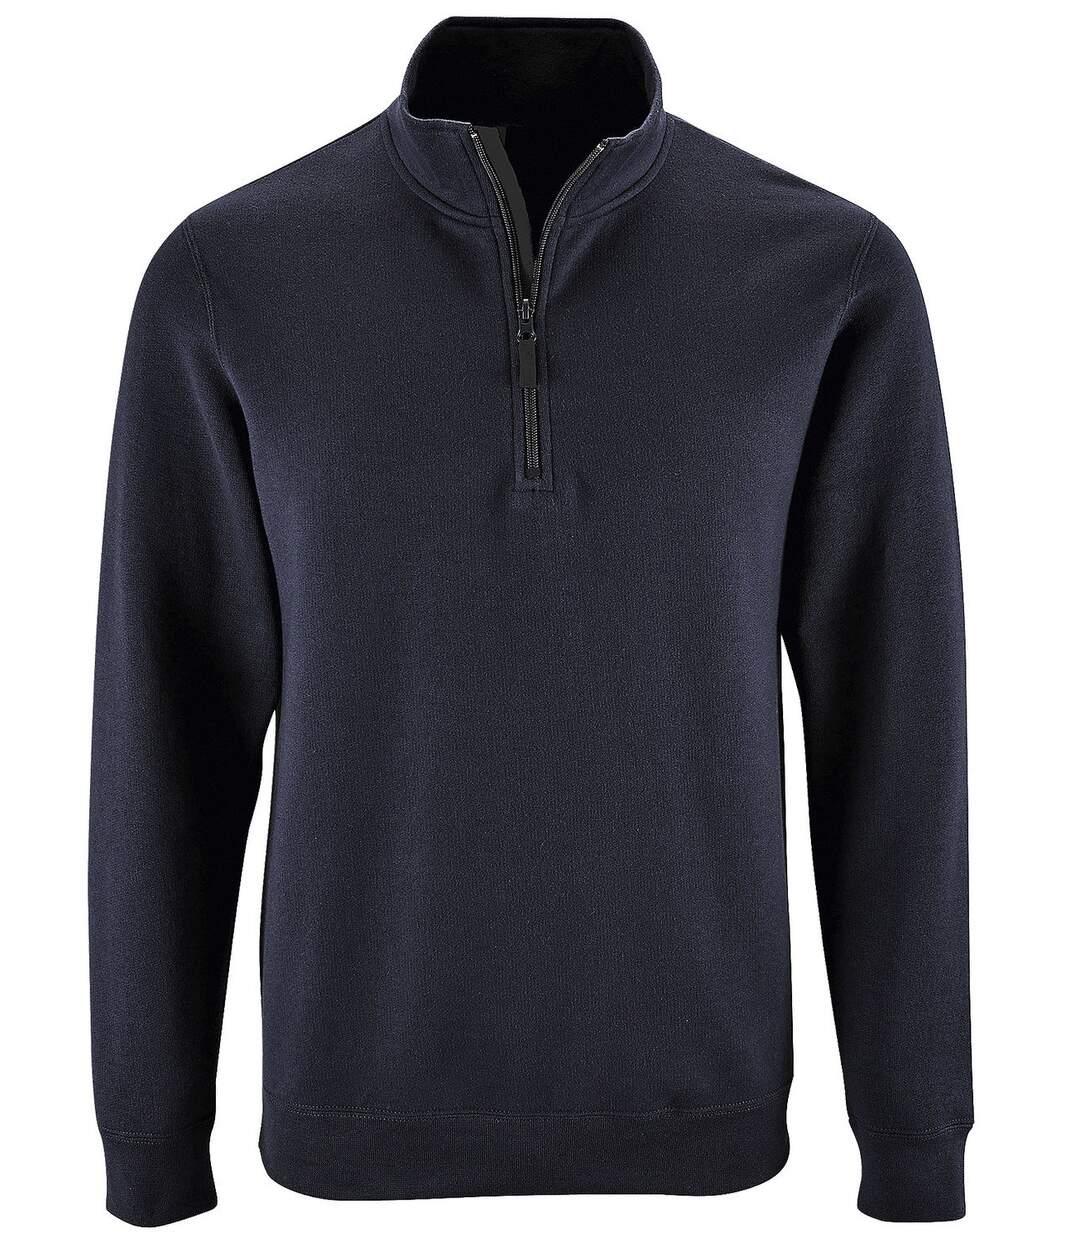 Sweat-shirt col camionneur - 02088 - bleu marine